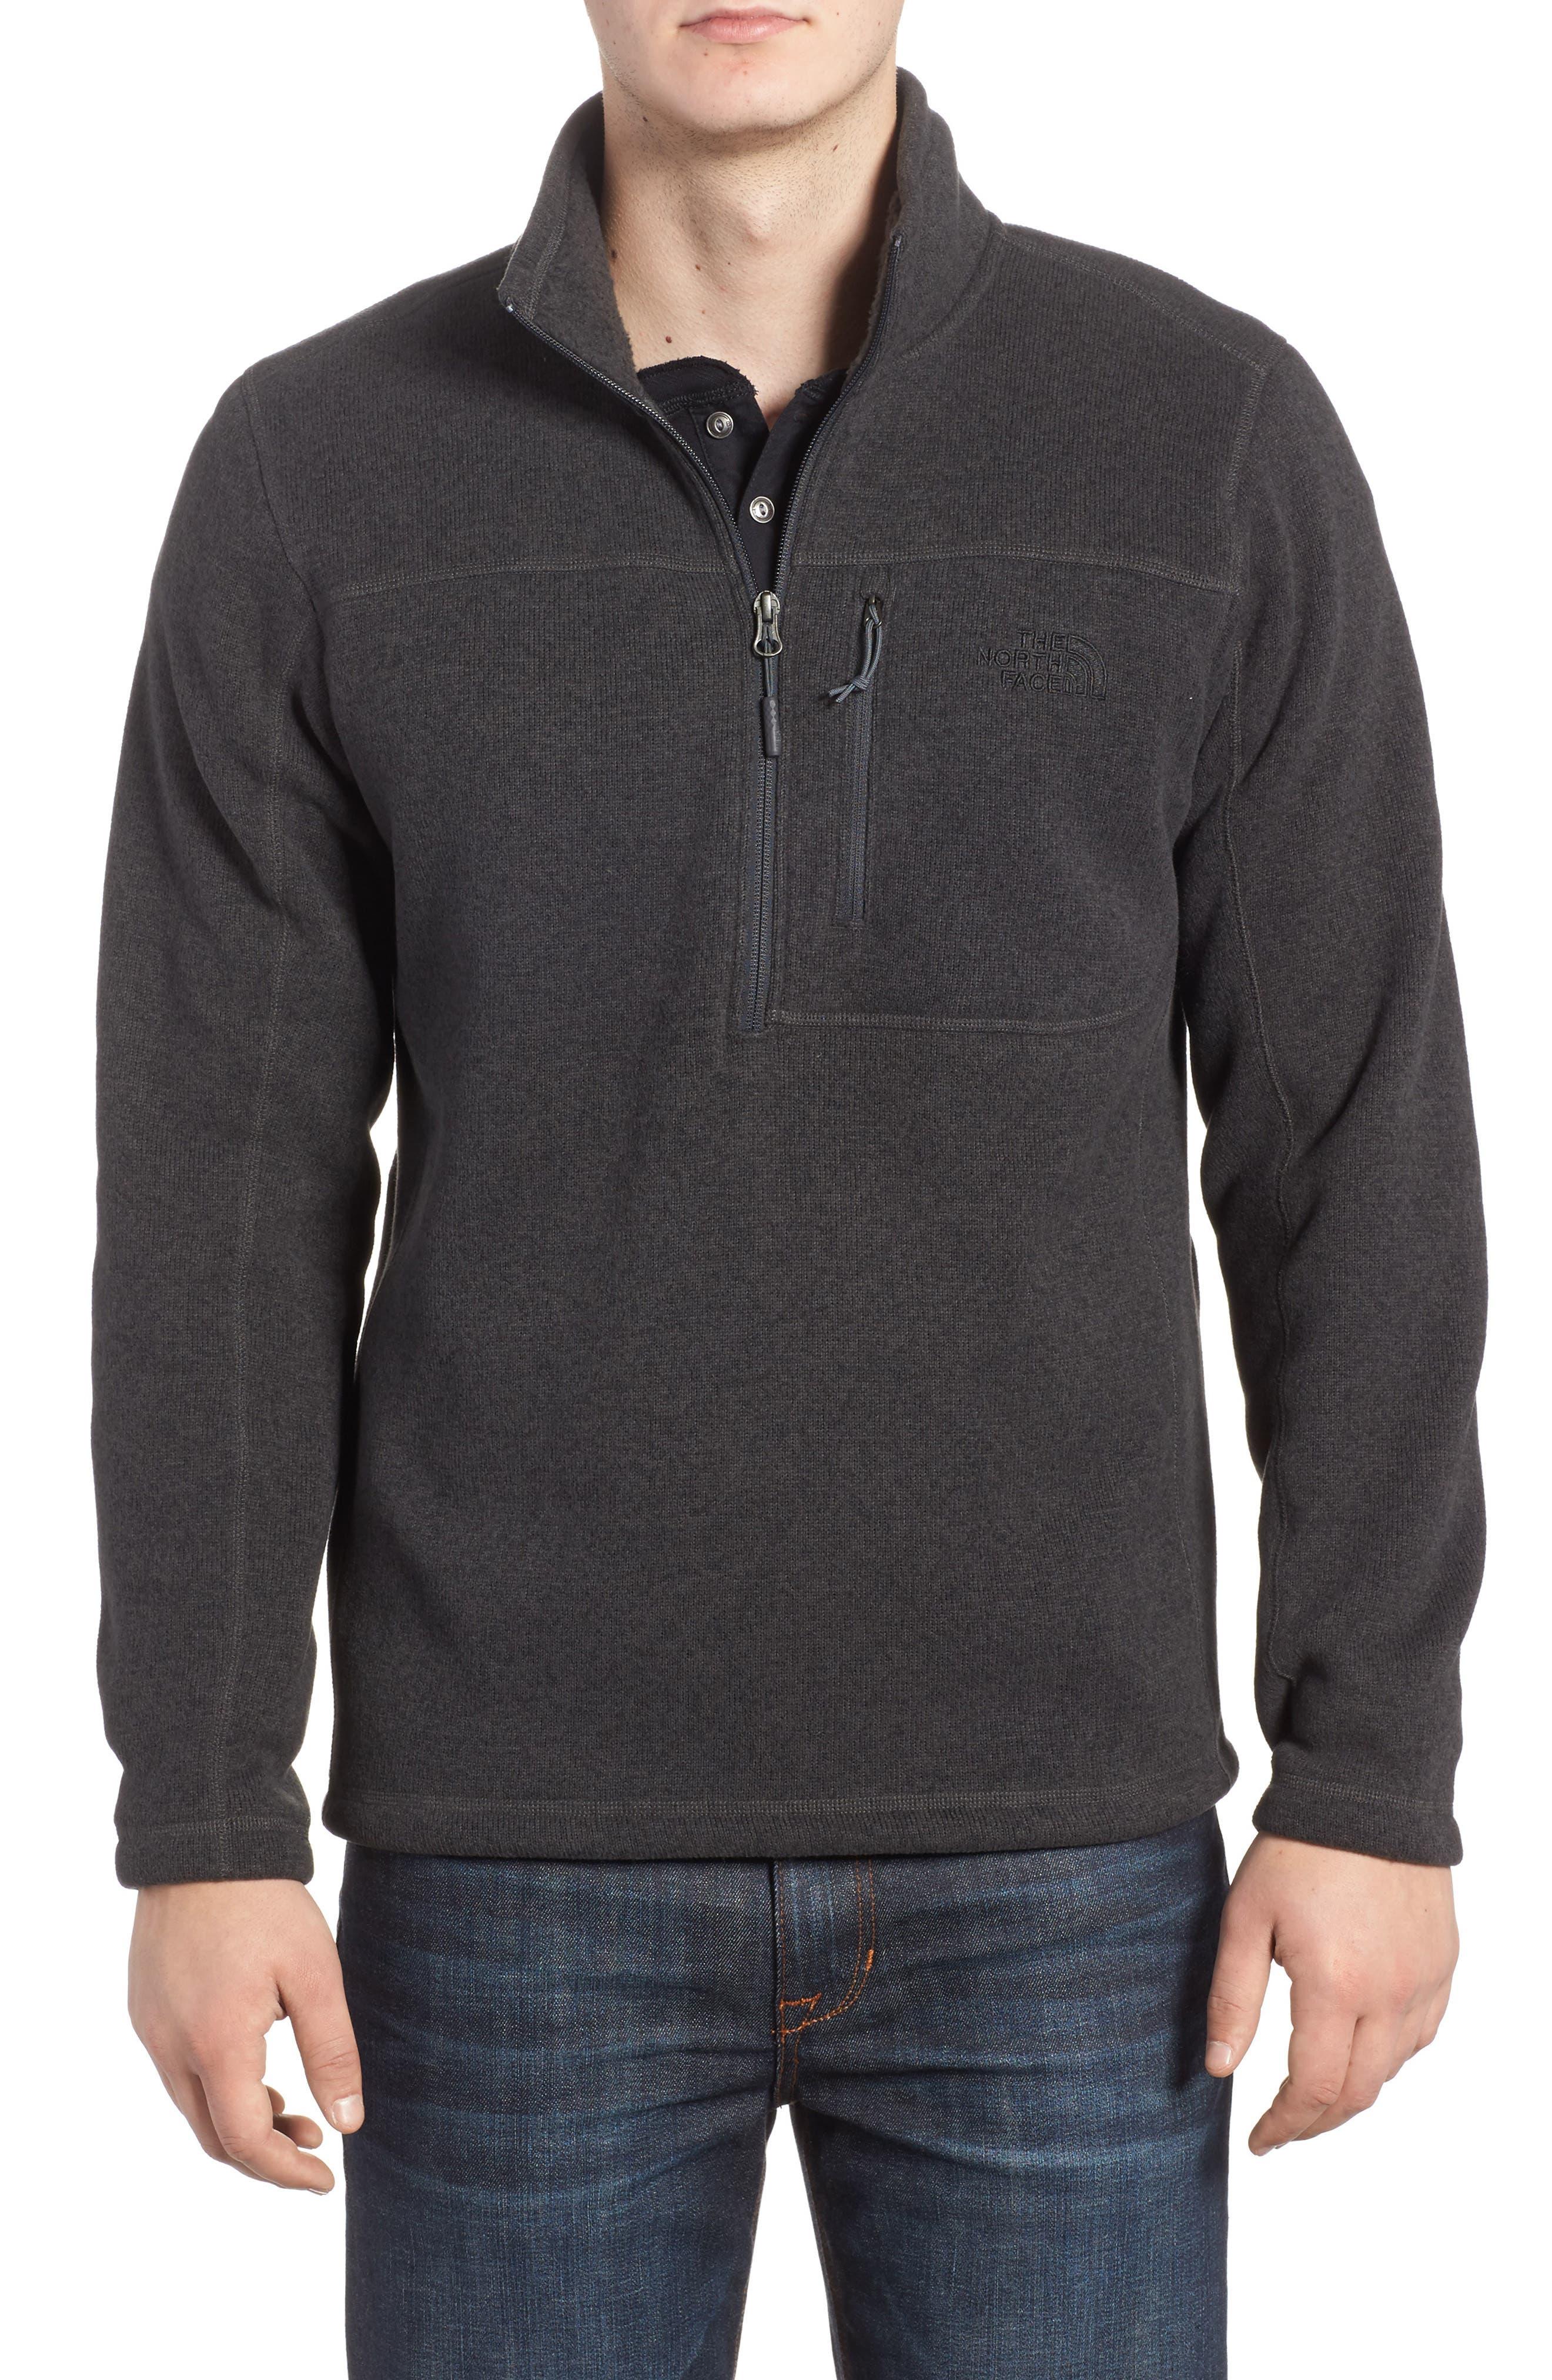 The North Face Gordon Lyons Quarter-Zip Fleece Jacket, Grey